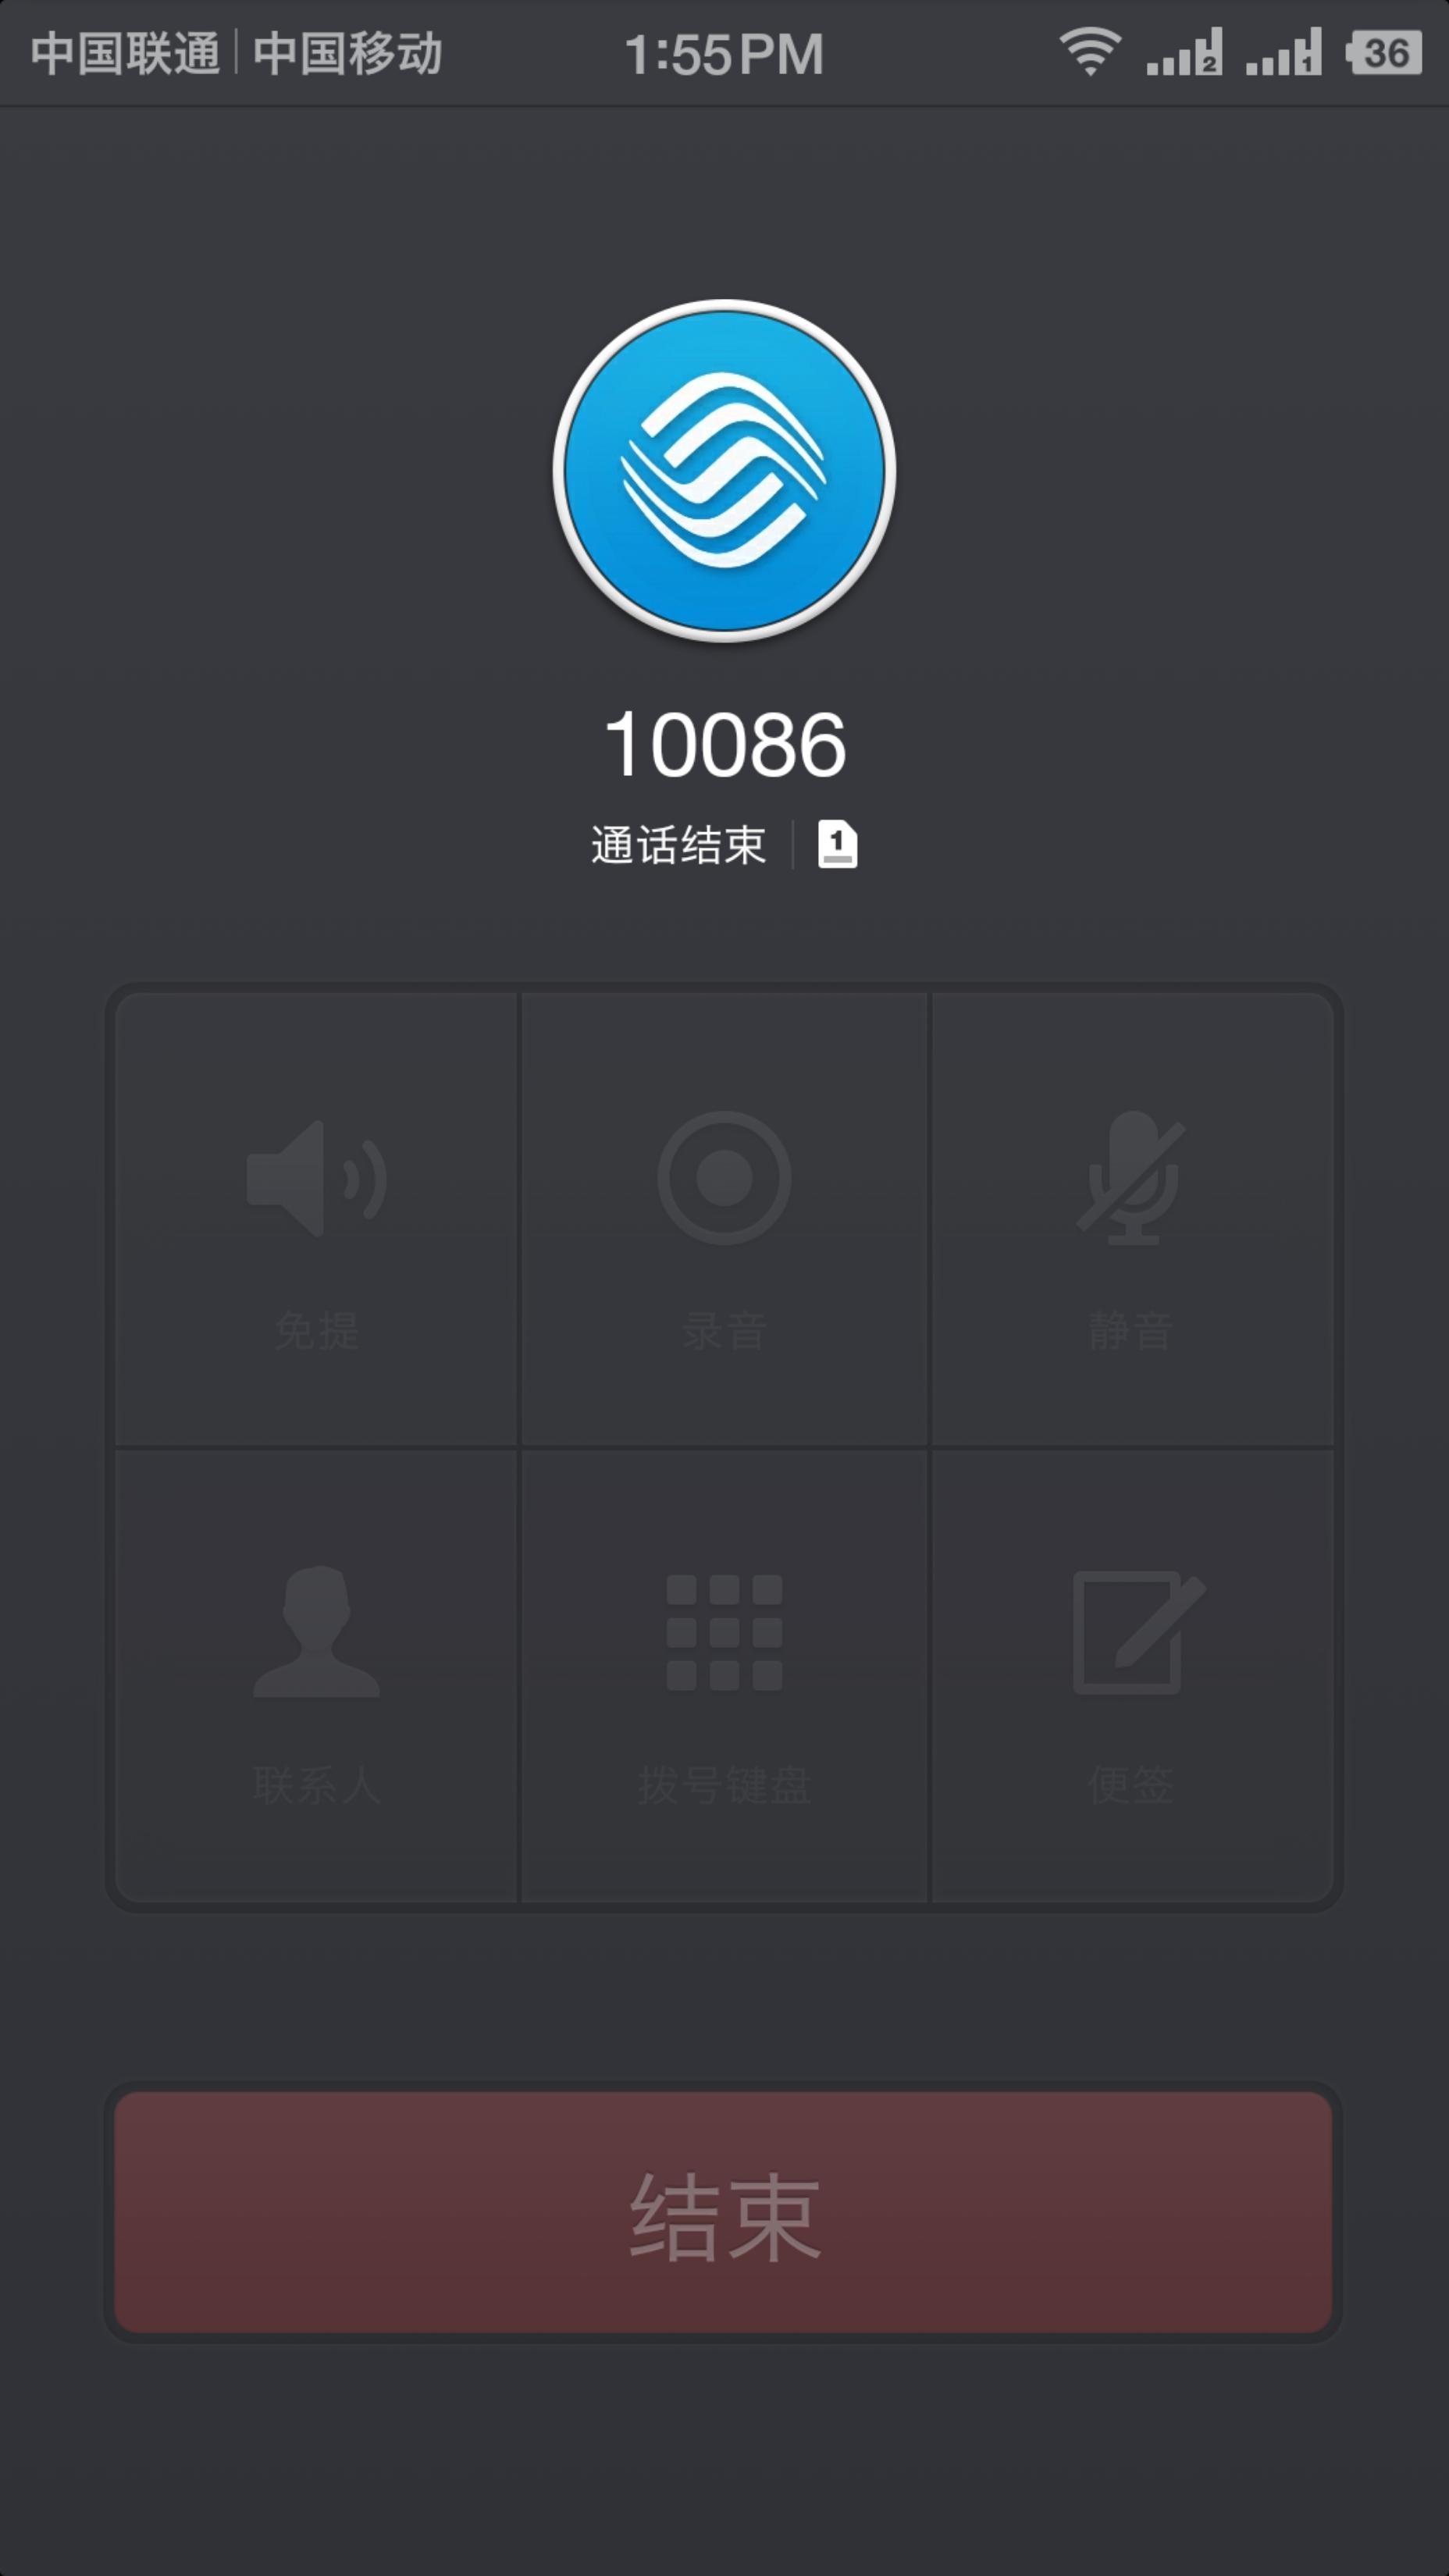 Screenshot_2019-07-17-13-55-13-783_??.png